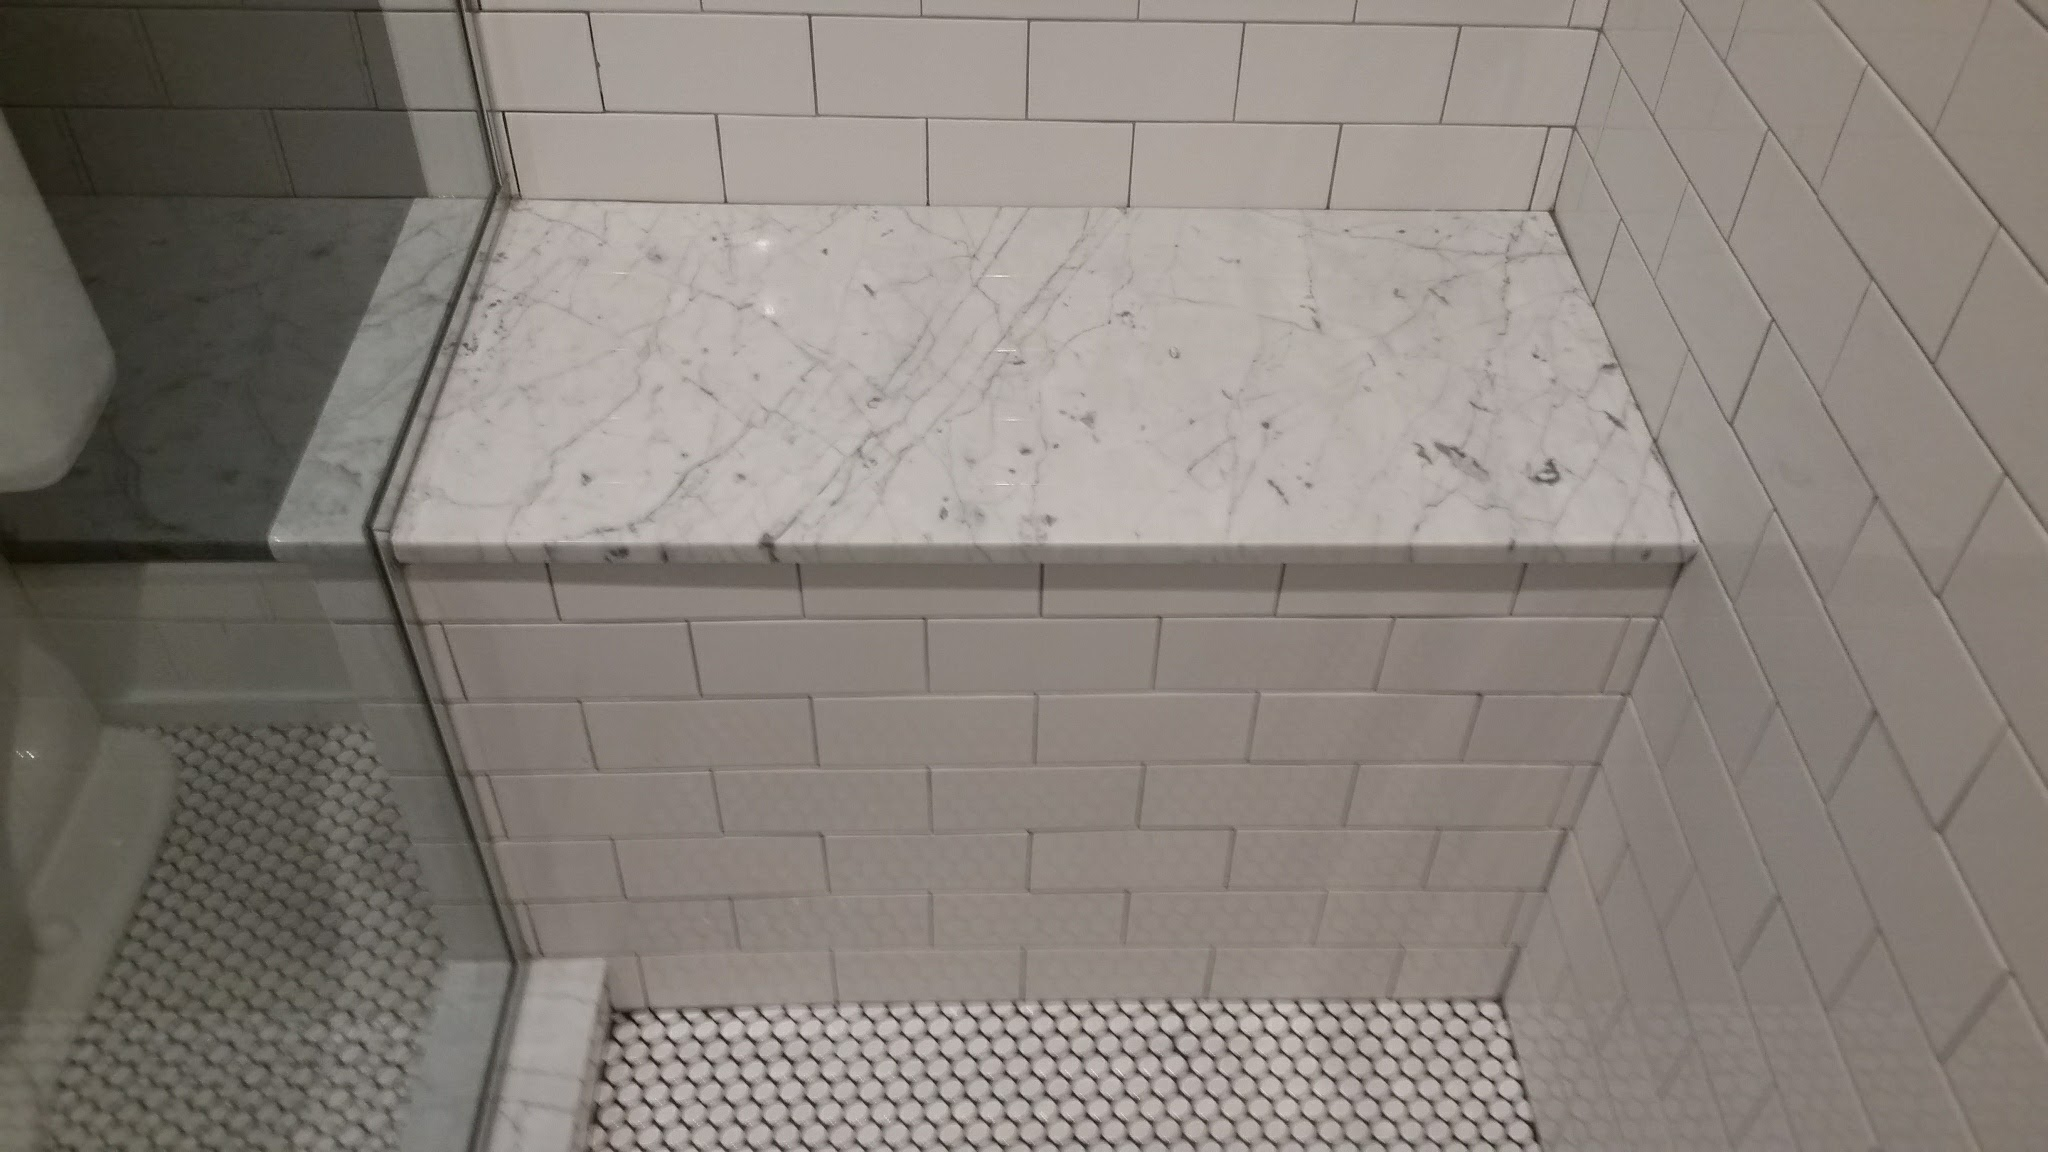 Tiled shower seat